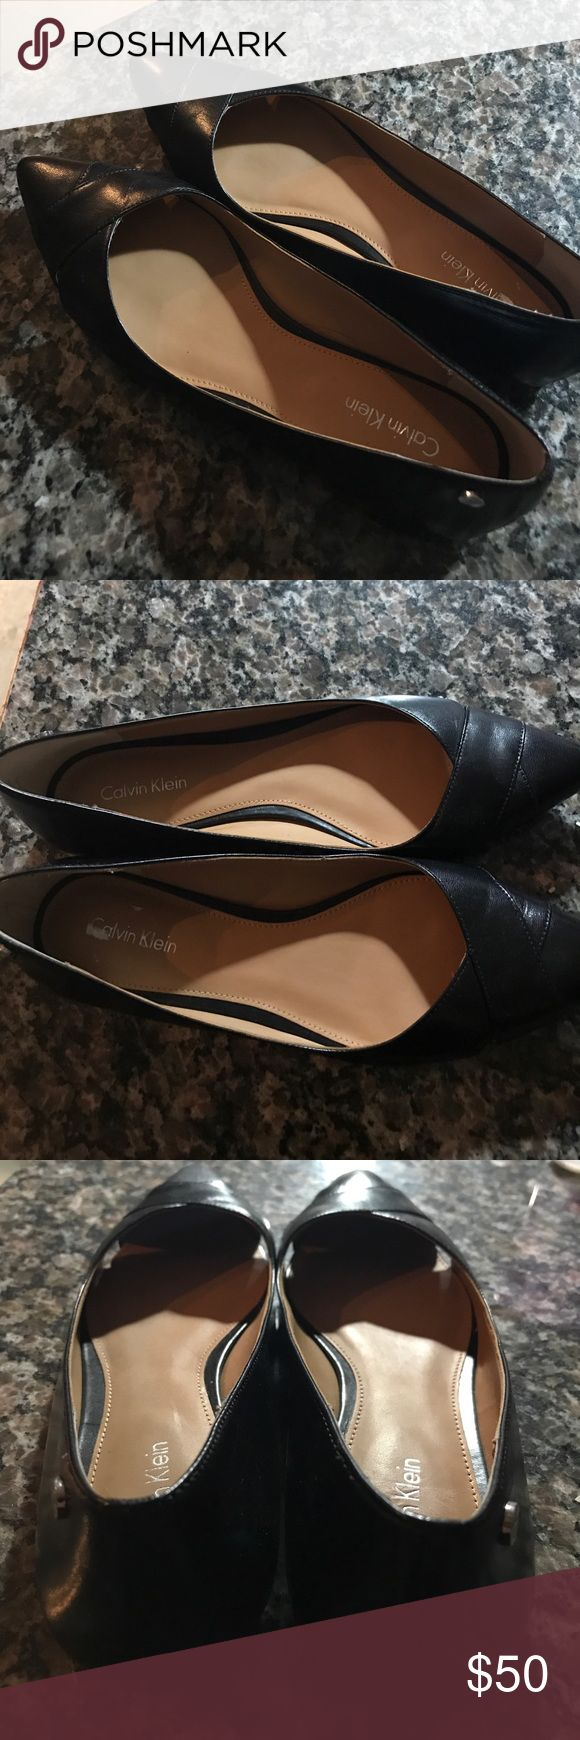 Calvin Klein Flats Never worn. Size 7. Calvin Klein Shoes Flats & Loafers